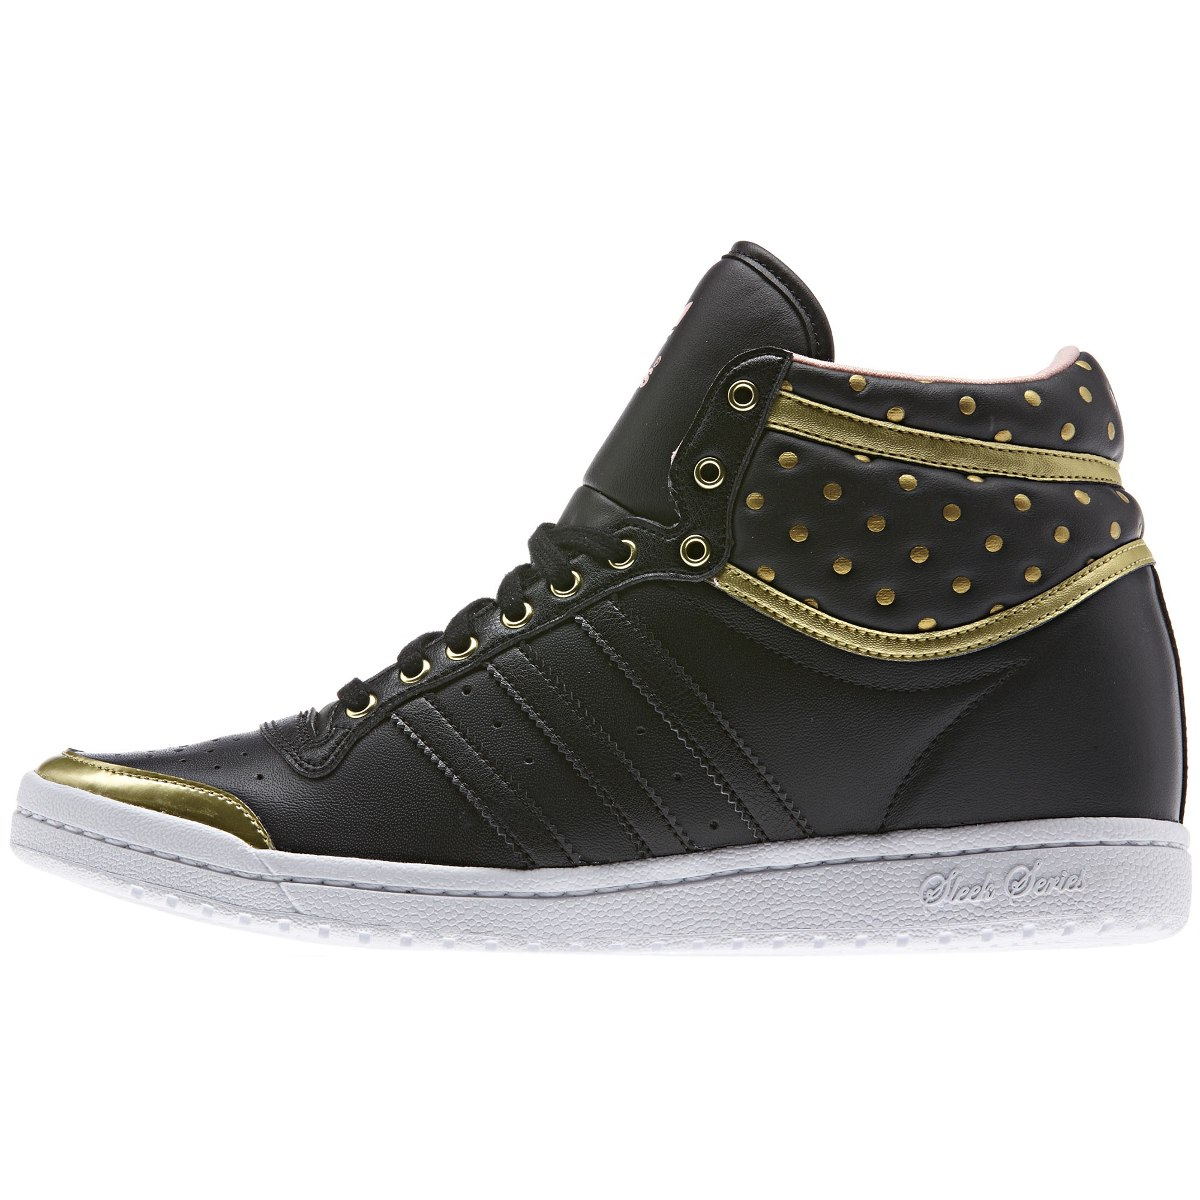 zapatillas adidas mujer negras botitas